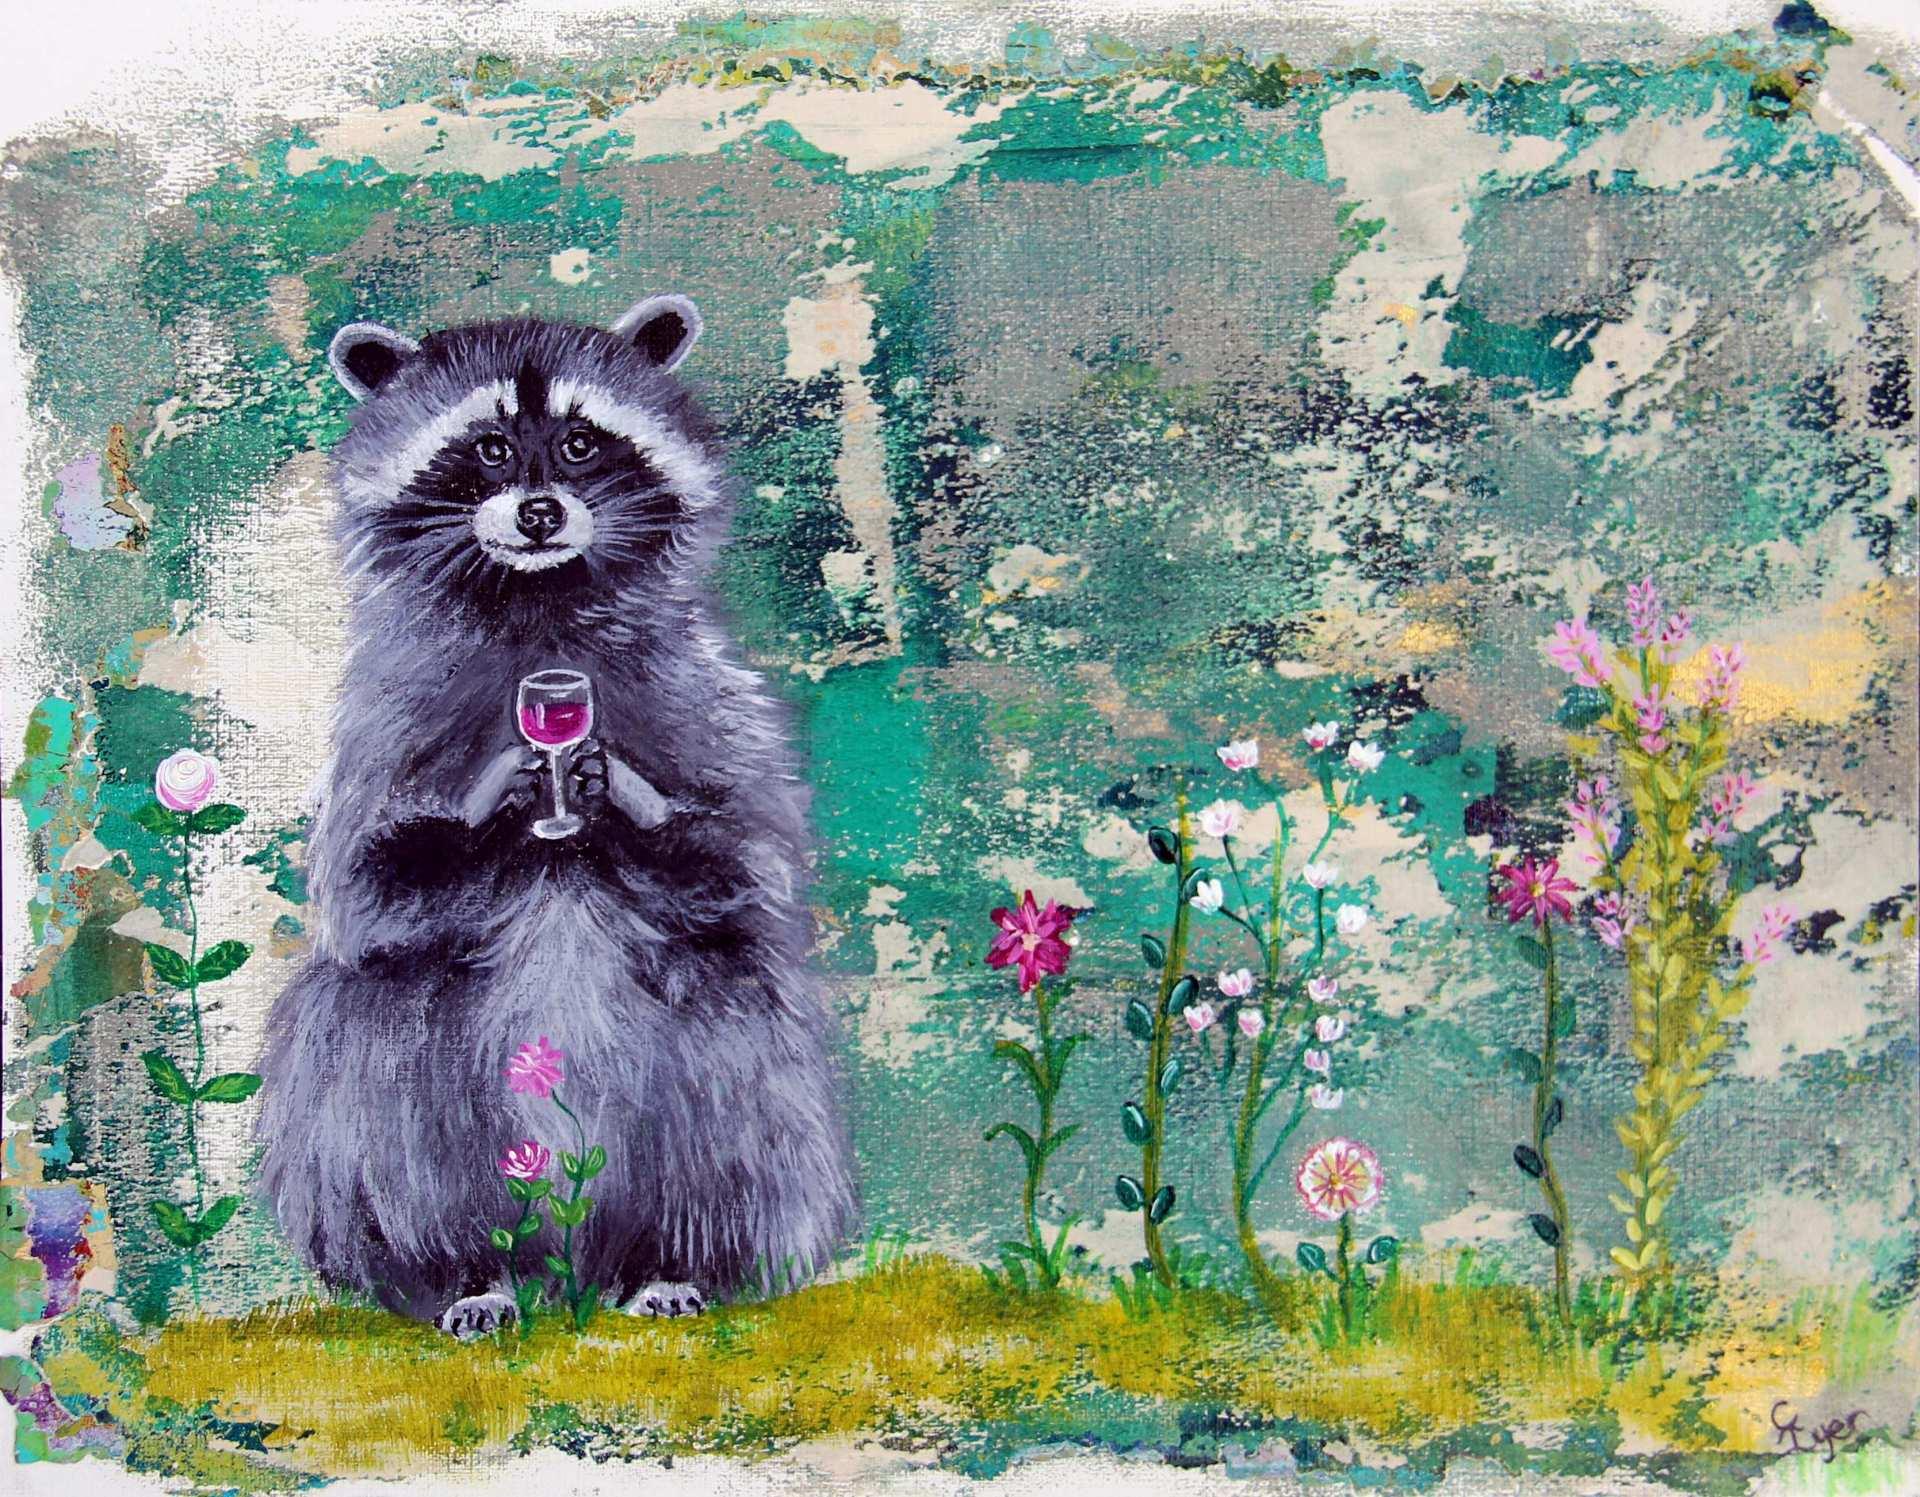 Raccoon with wine